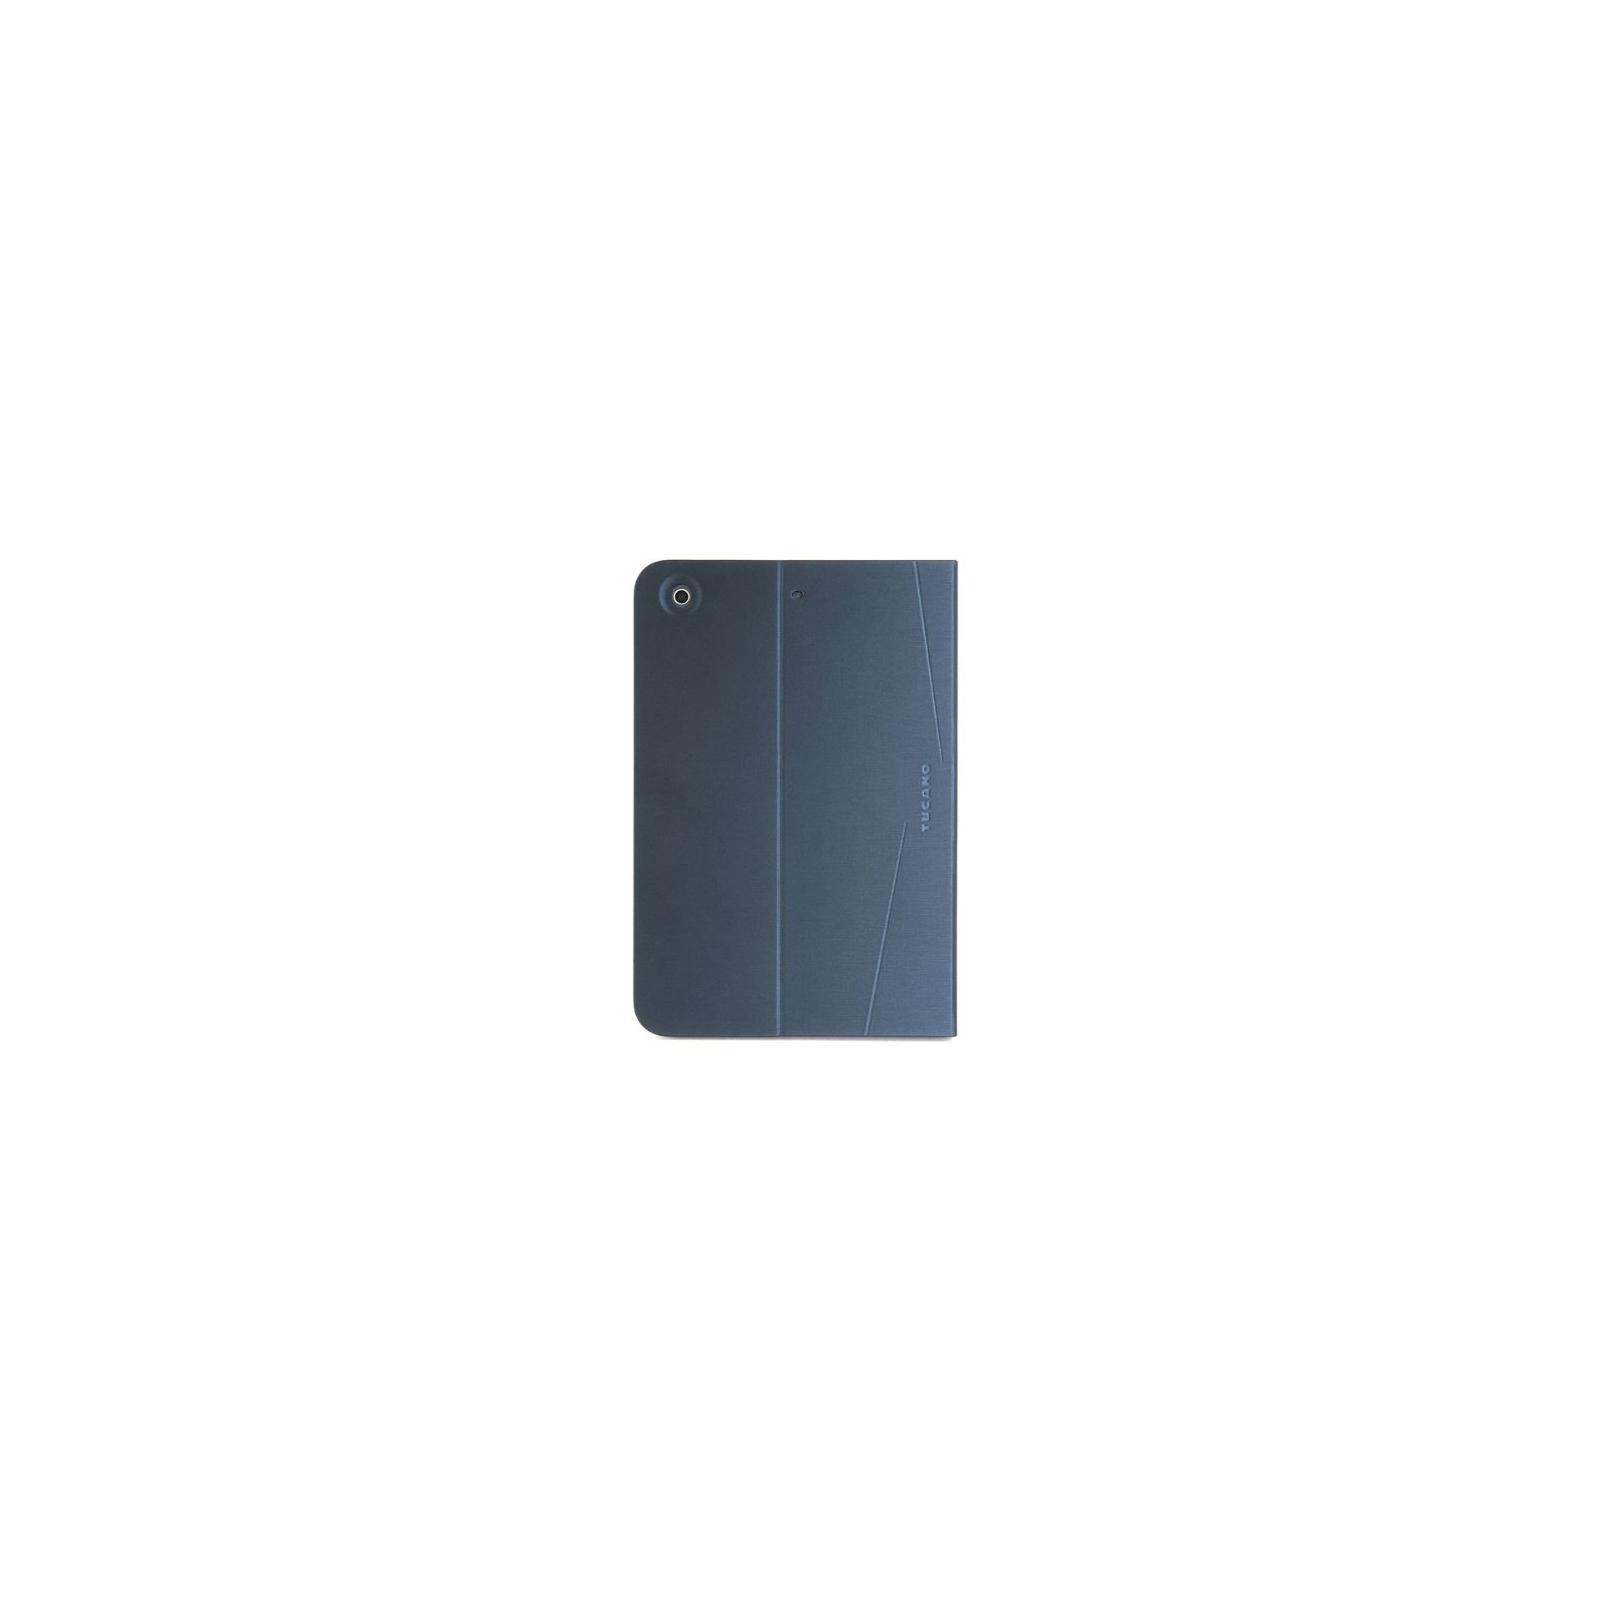 Чехол для планшета Tucano iPad Air Filo Blue (IPD5FI-BS) изображение 4